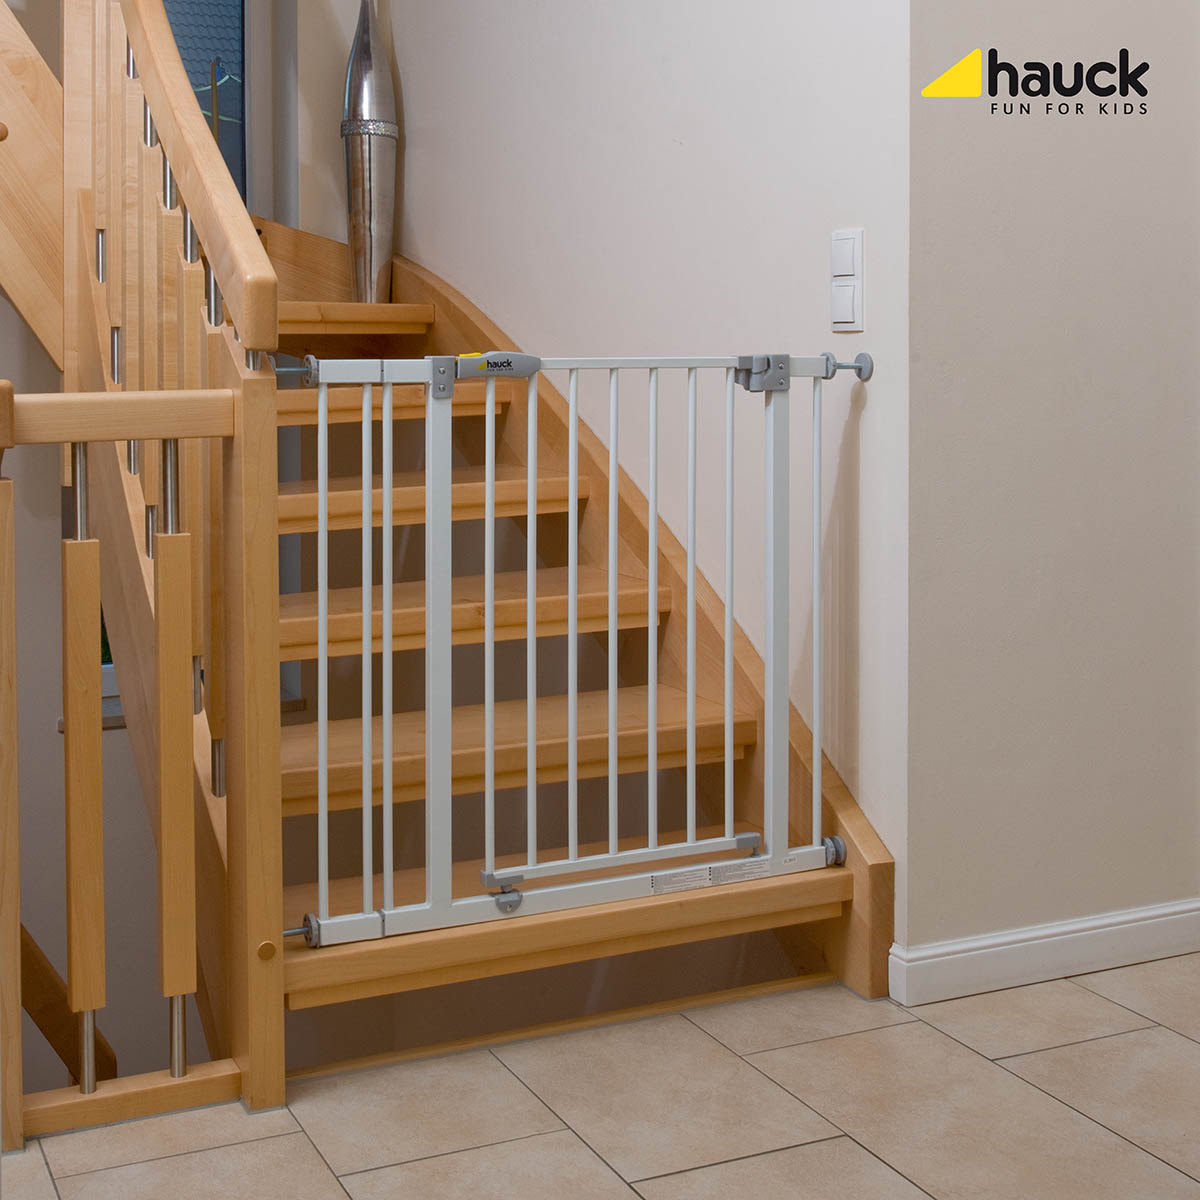 Hauck drošības vārtiņi trepēm 74 - 81,5 cm - Open and Stop Safety Gate